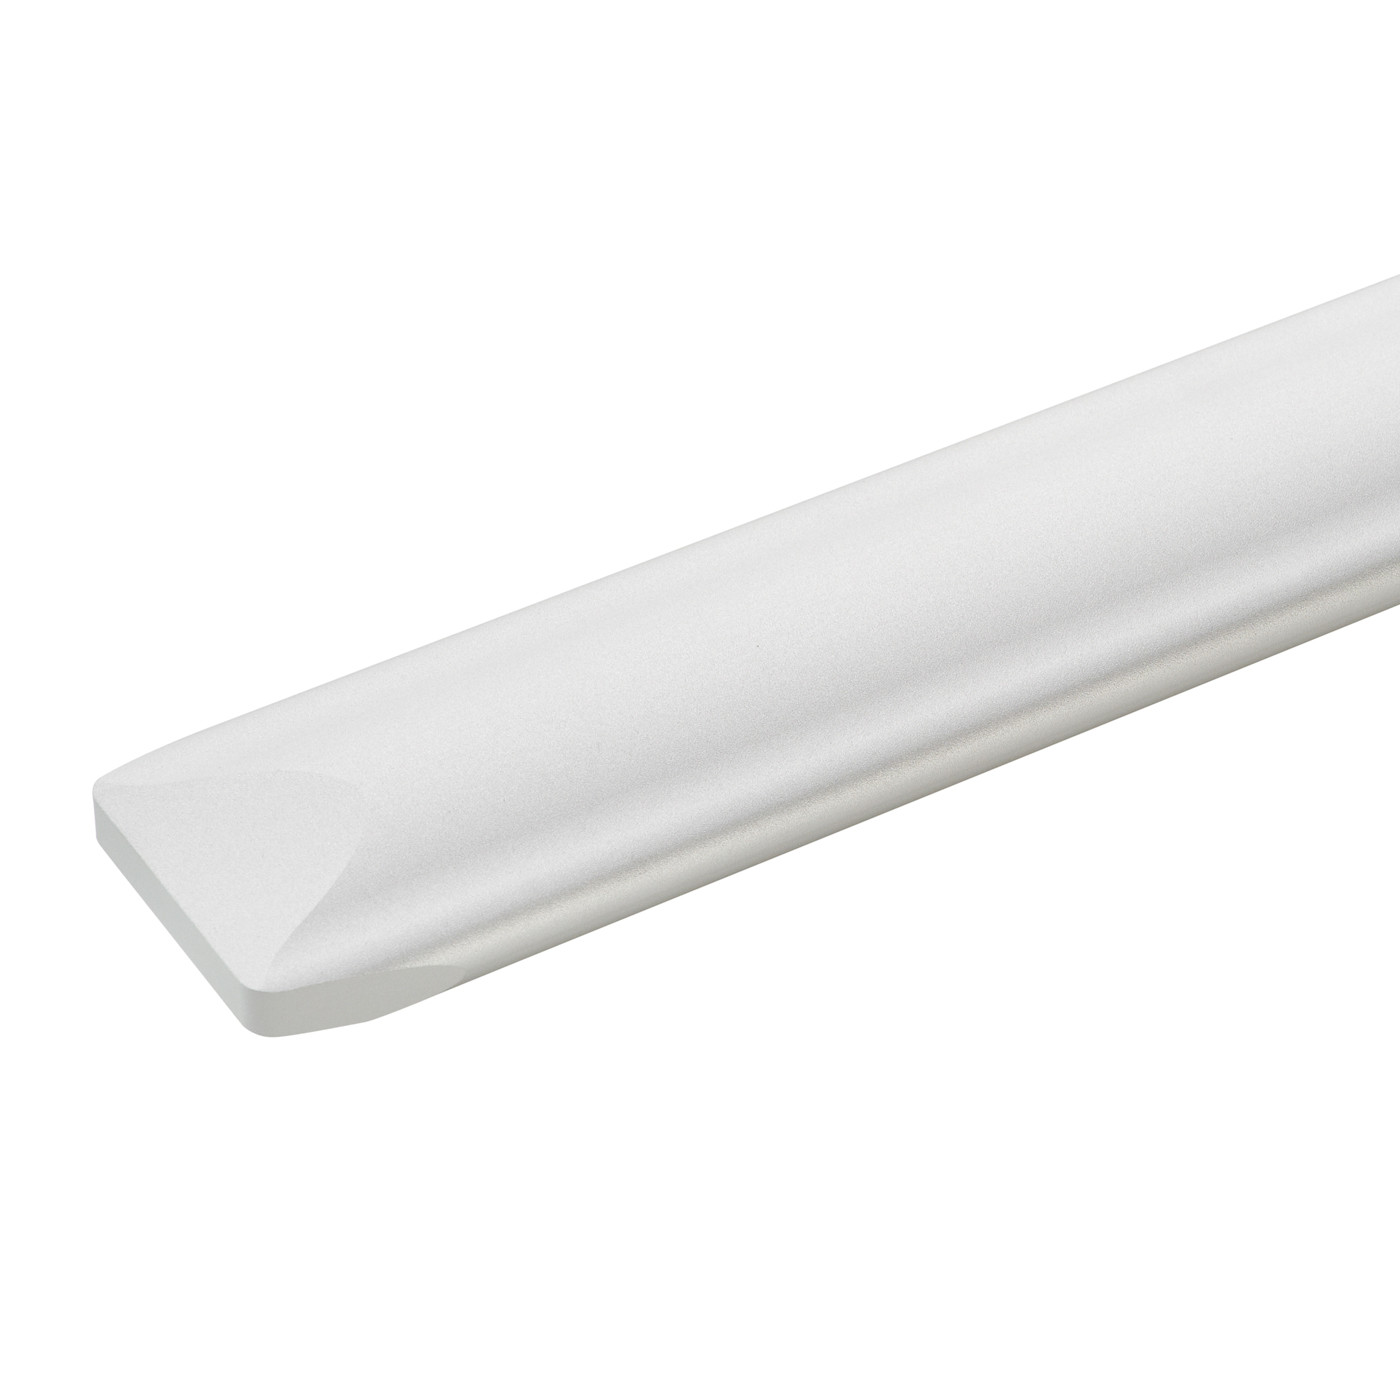 Liin Light Innovations Anax CC Pendelleuchte